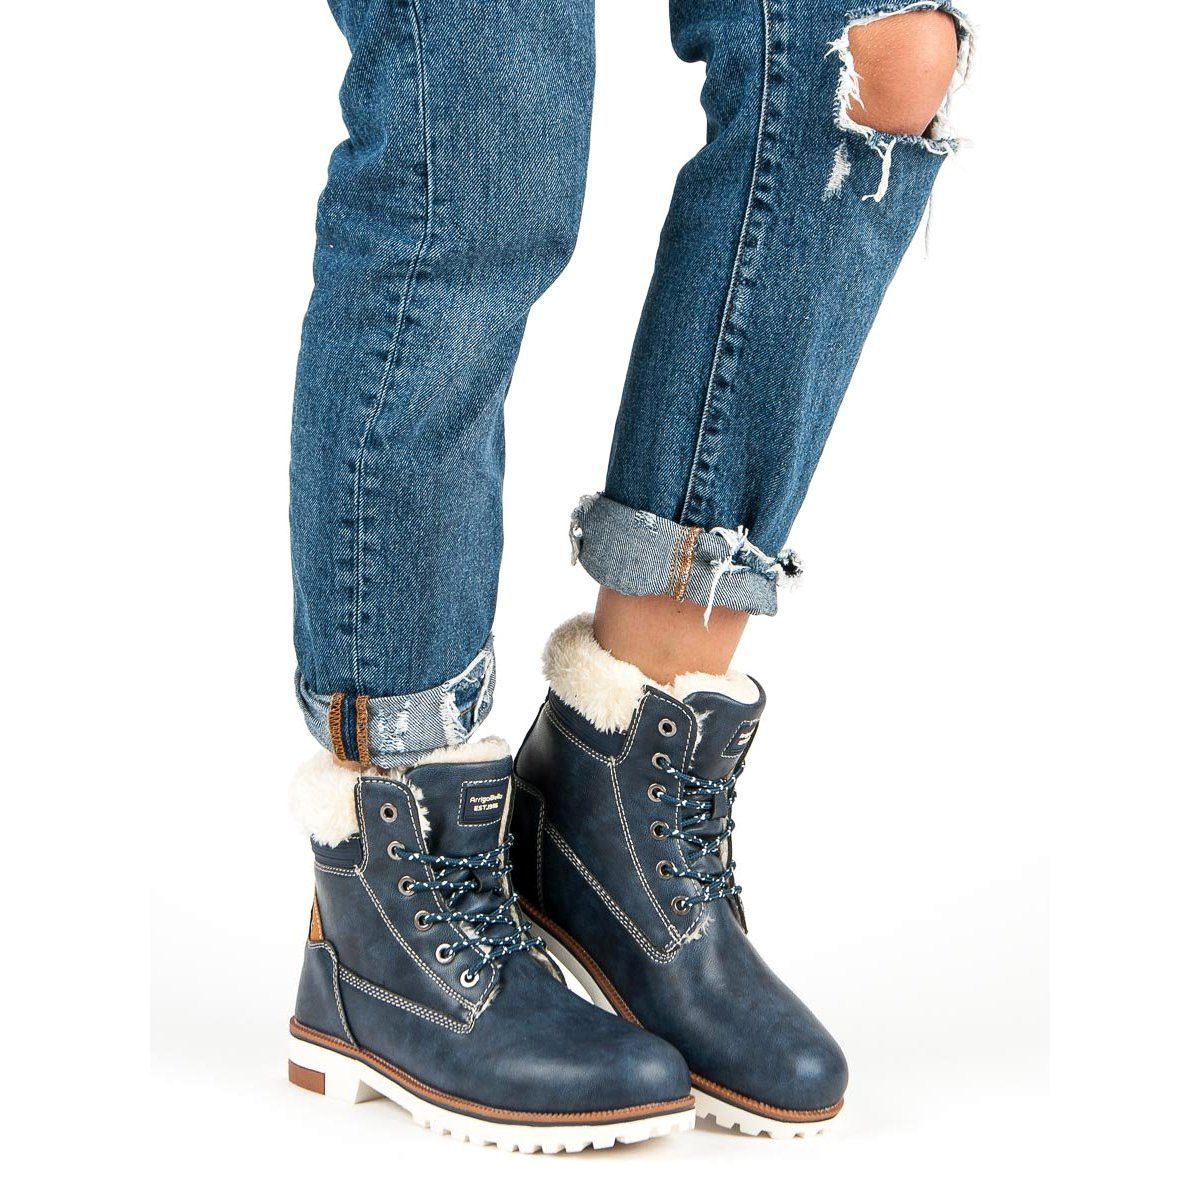 Arrigo Bello Cieple Zimowe Traperki Niebieskie Womens Boots Boots Boot Shoes Women